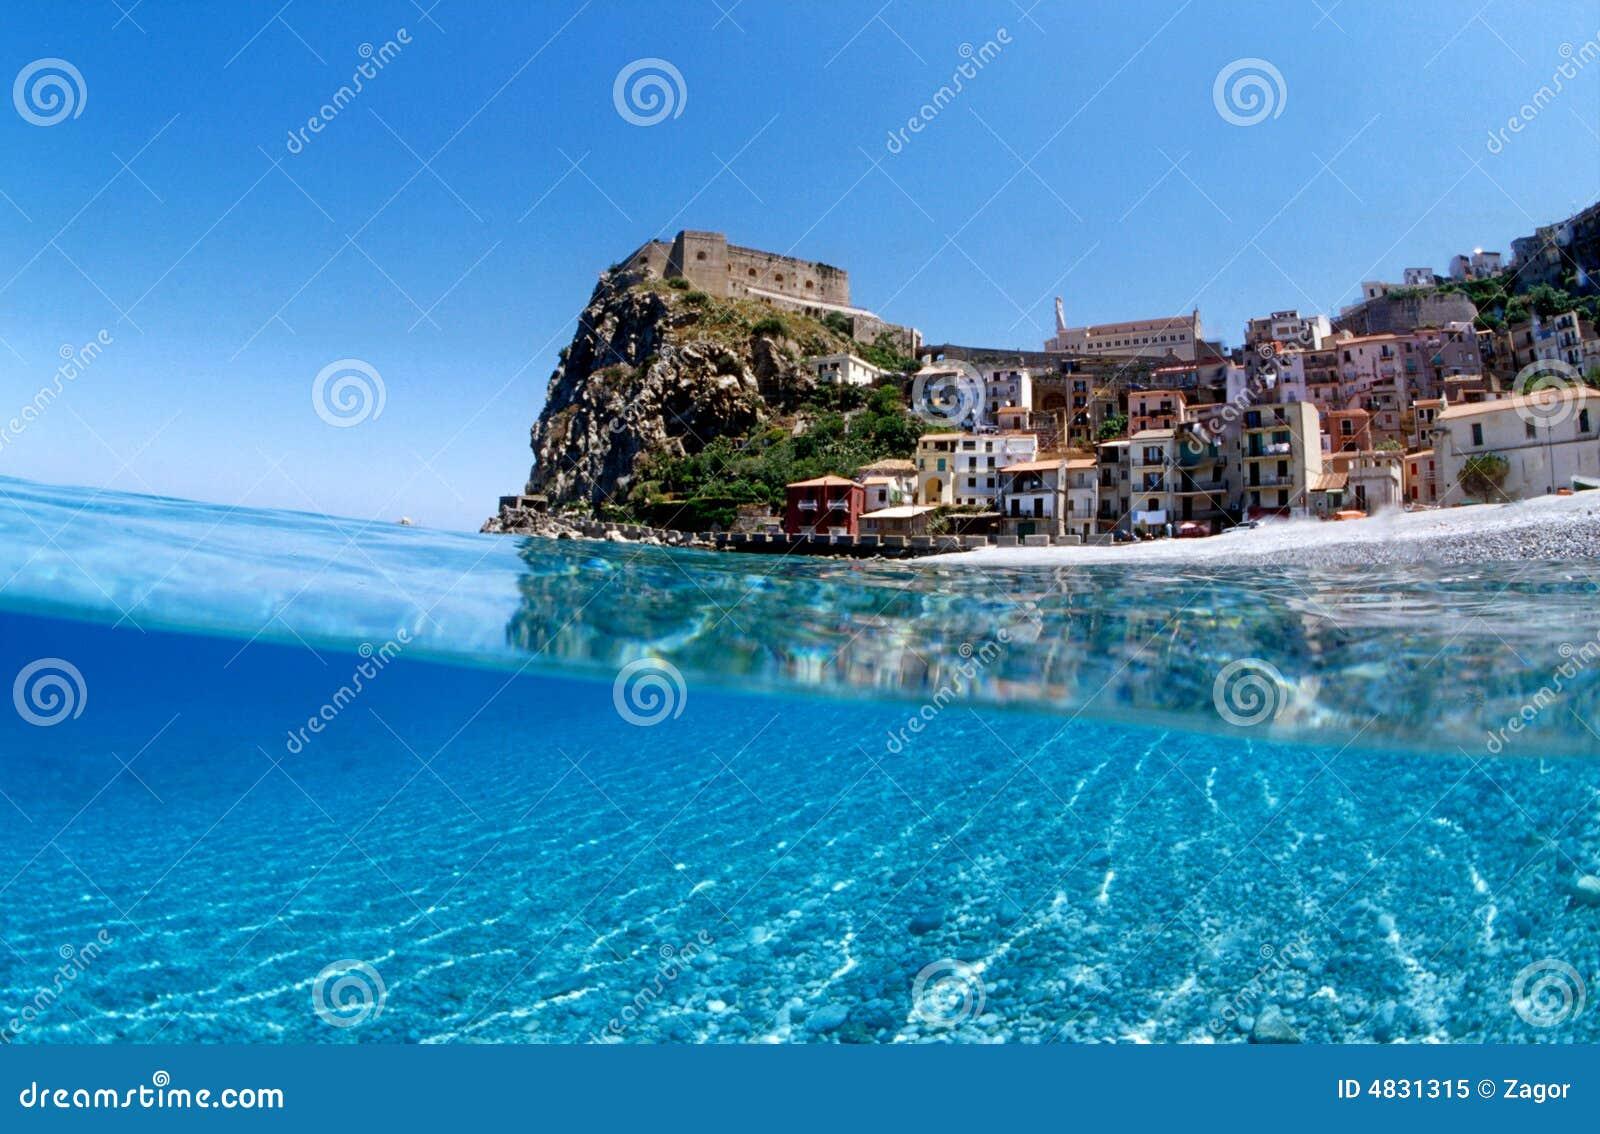 Sea wave under the castle